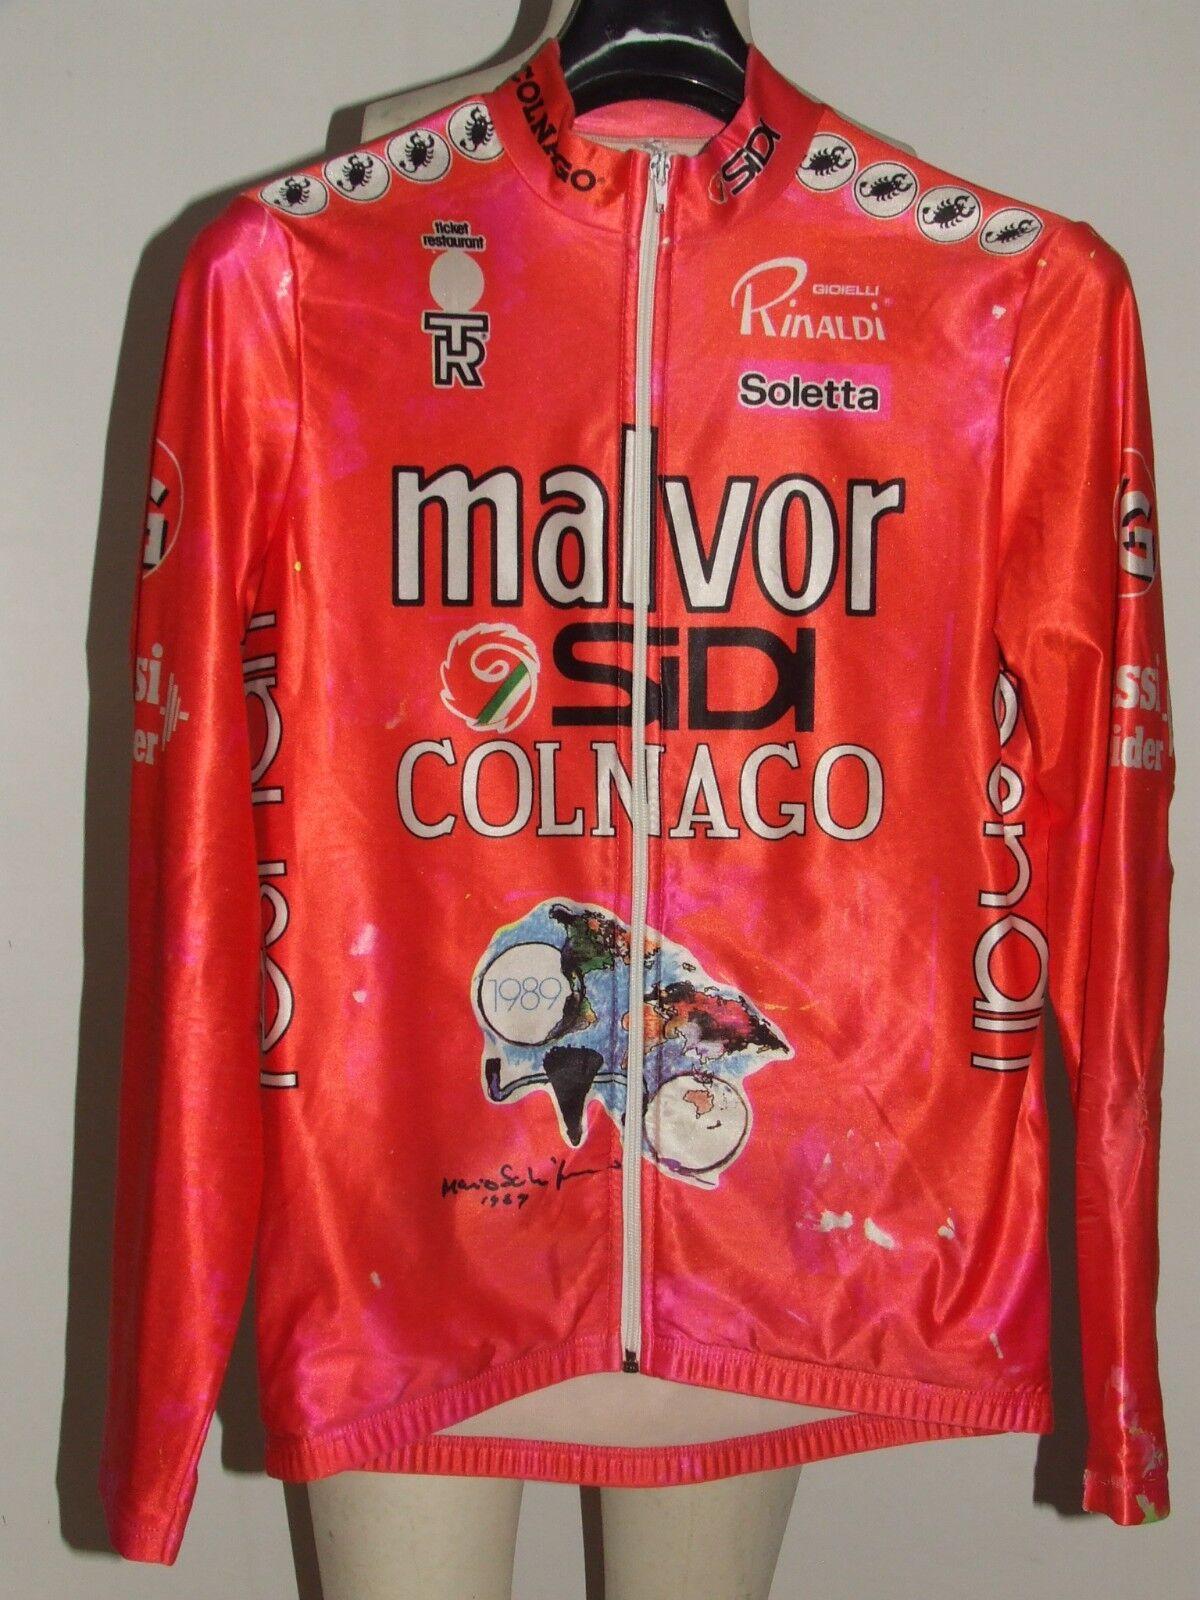 Trikot Fahrrad Jacke Radsport MALVOR COLNAGO S FANO CASTELLI tg. M